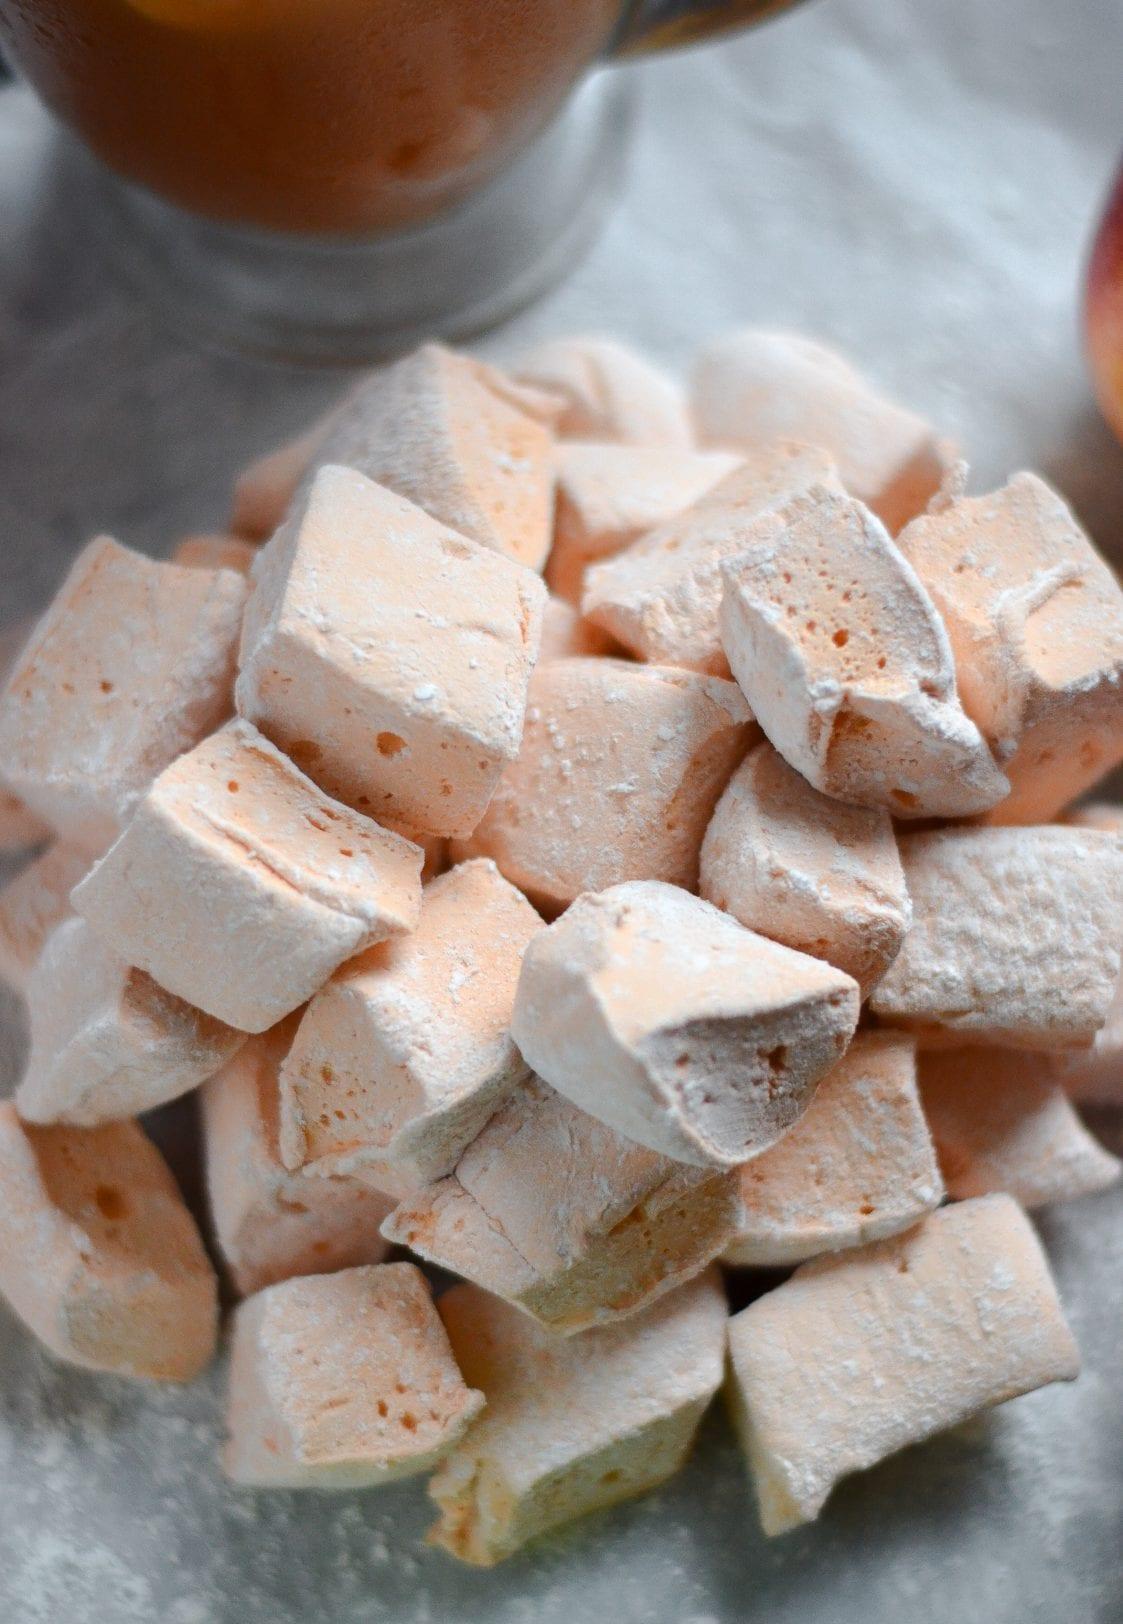 Spiced Cider Marshmallows